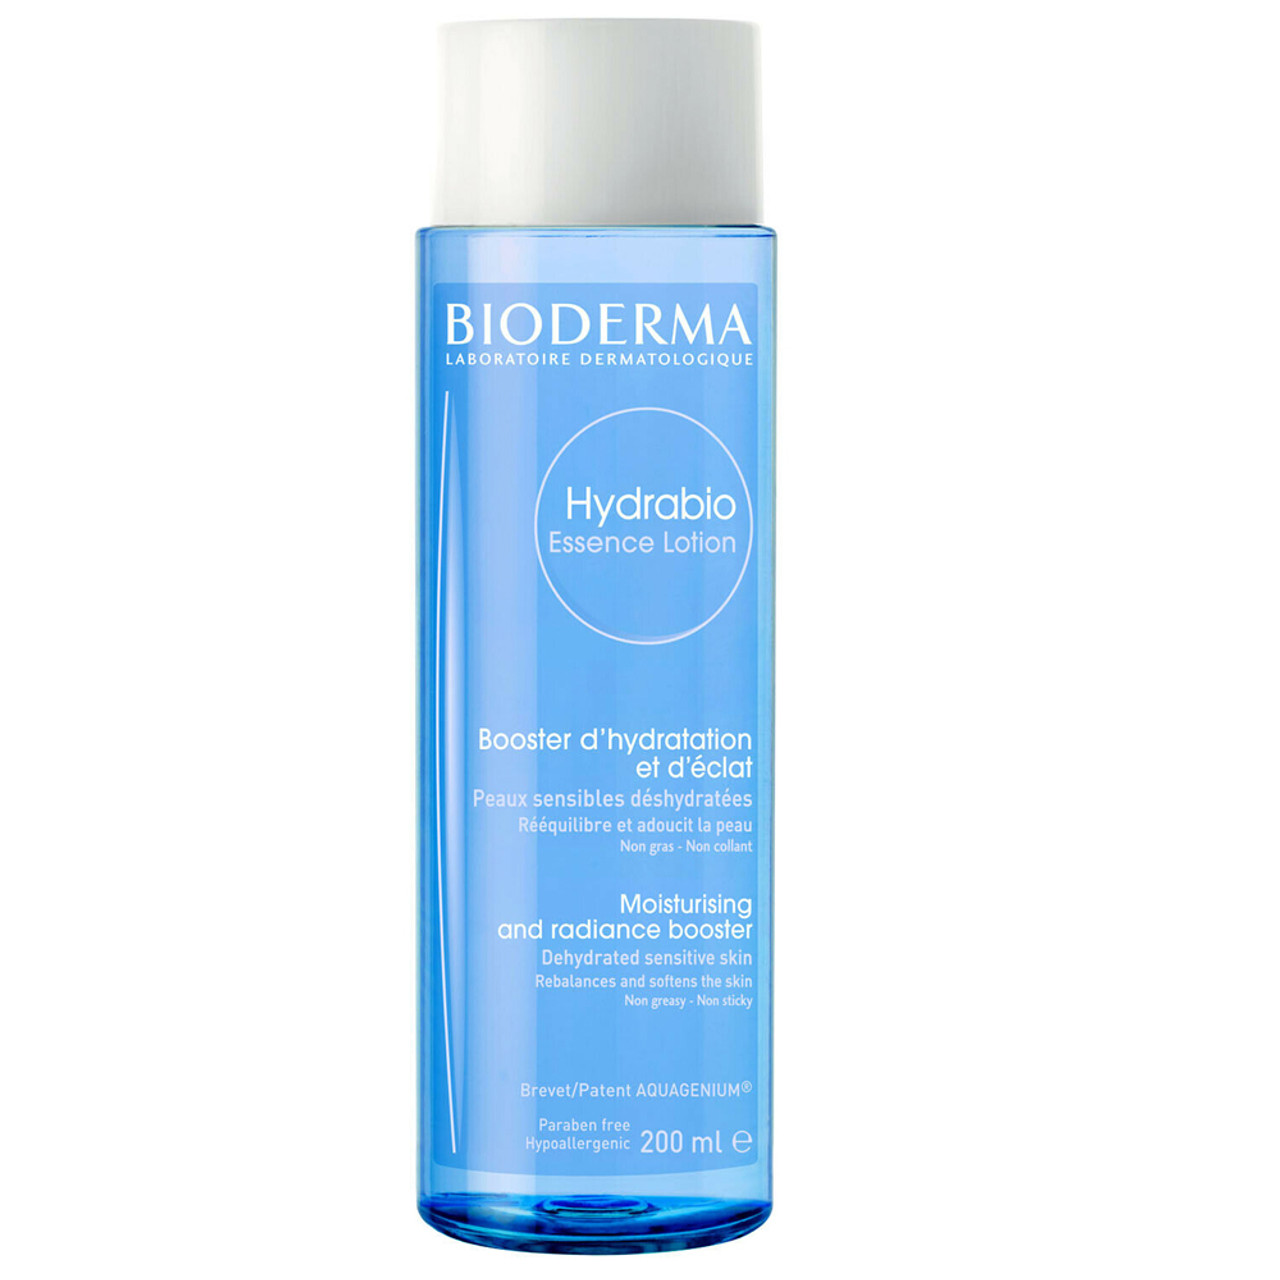 Bioderma Hydrabio Essence Lotion BeautifiedYou.com